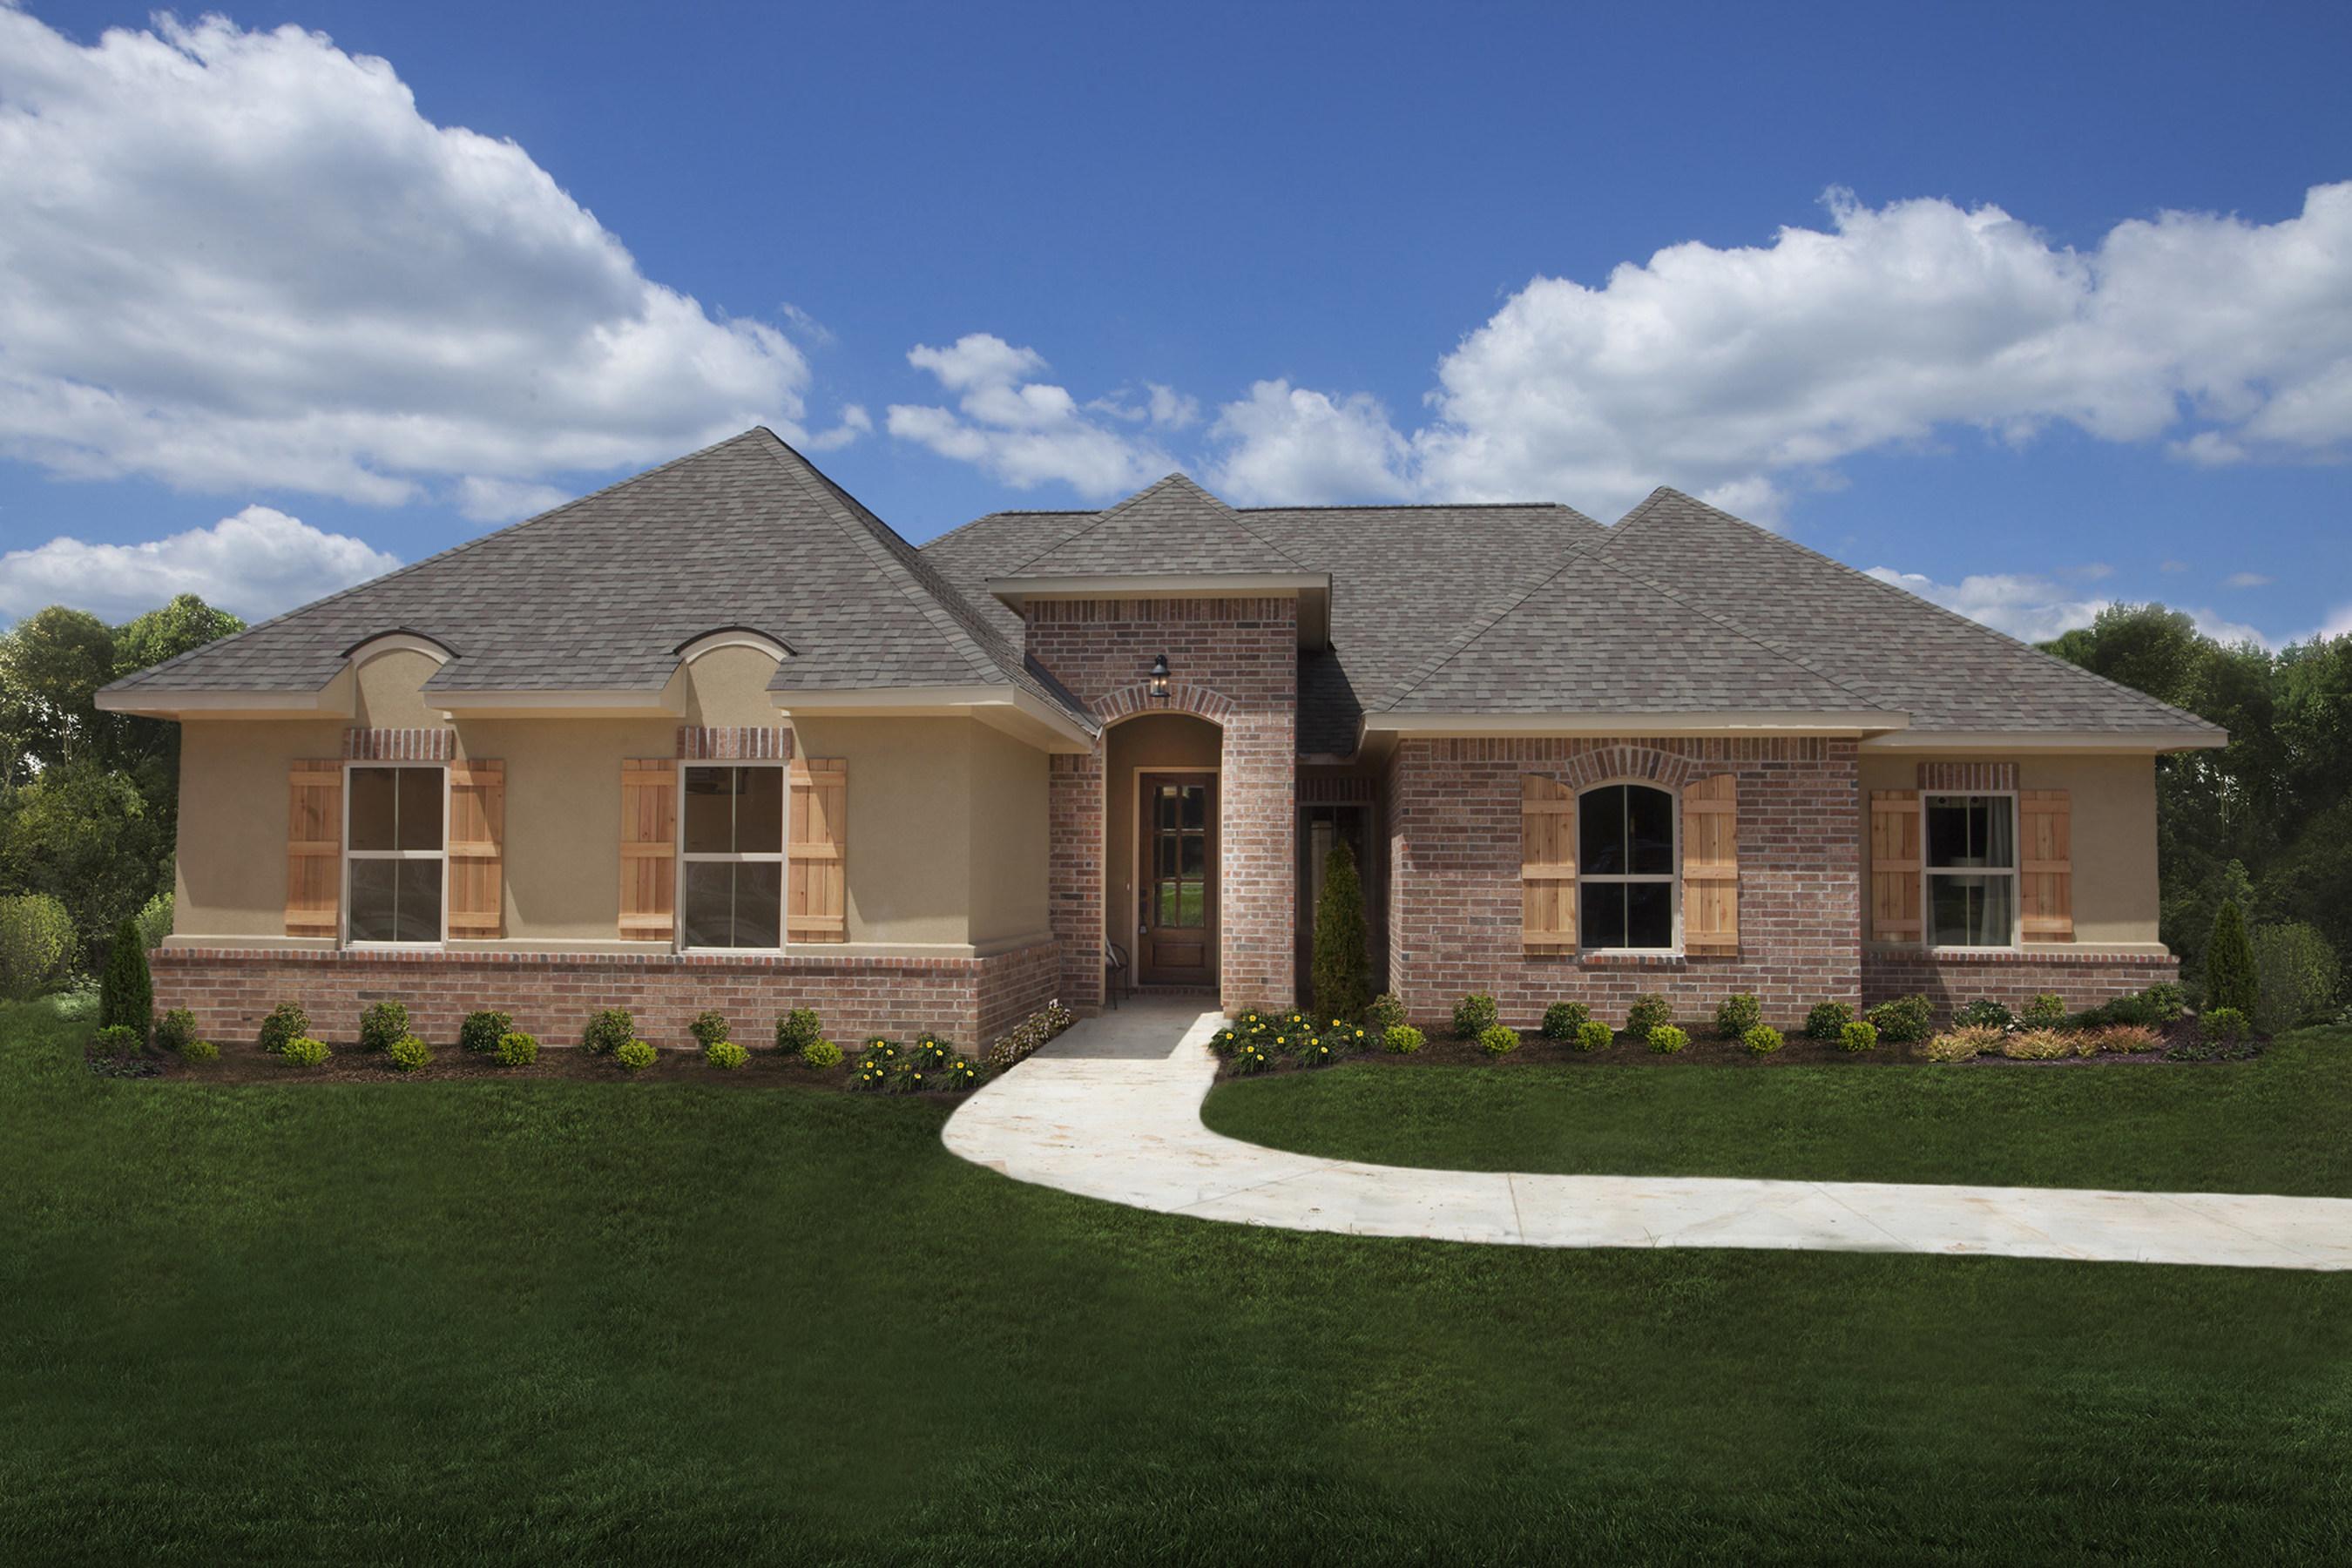 Custom Home Builder Schumacher Homes Opens New Model Home And Design Studio  In Baton Rouge/New Orleans, LA Market